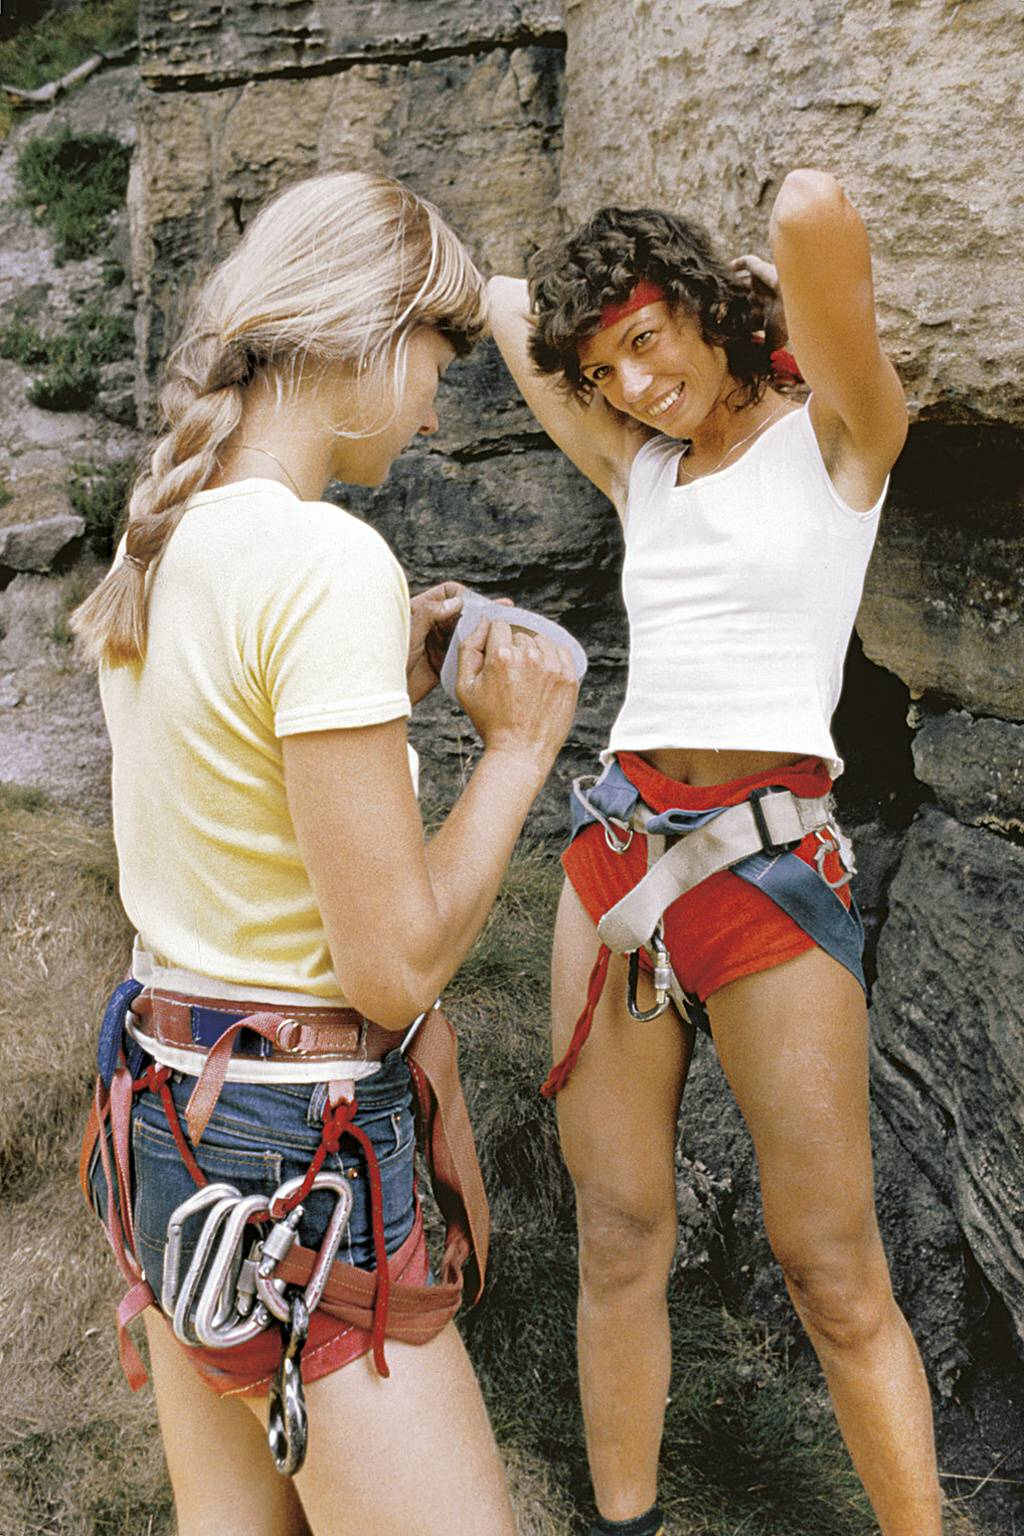 Of girls and boys on the rocks | eMontana